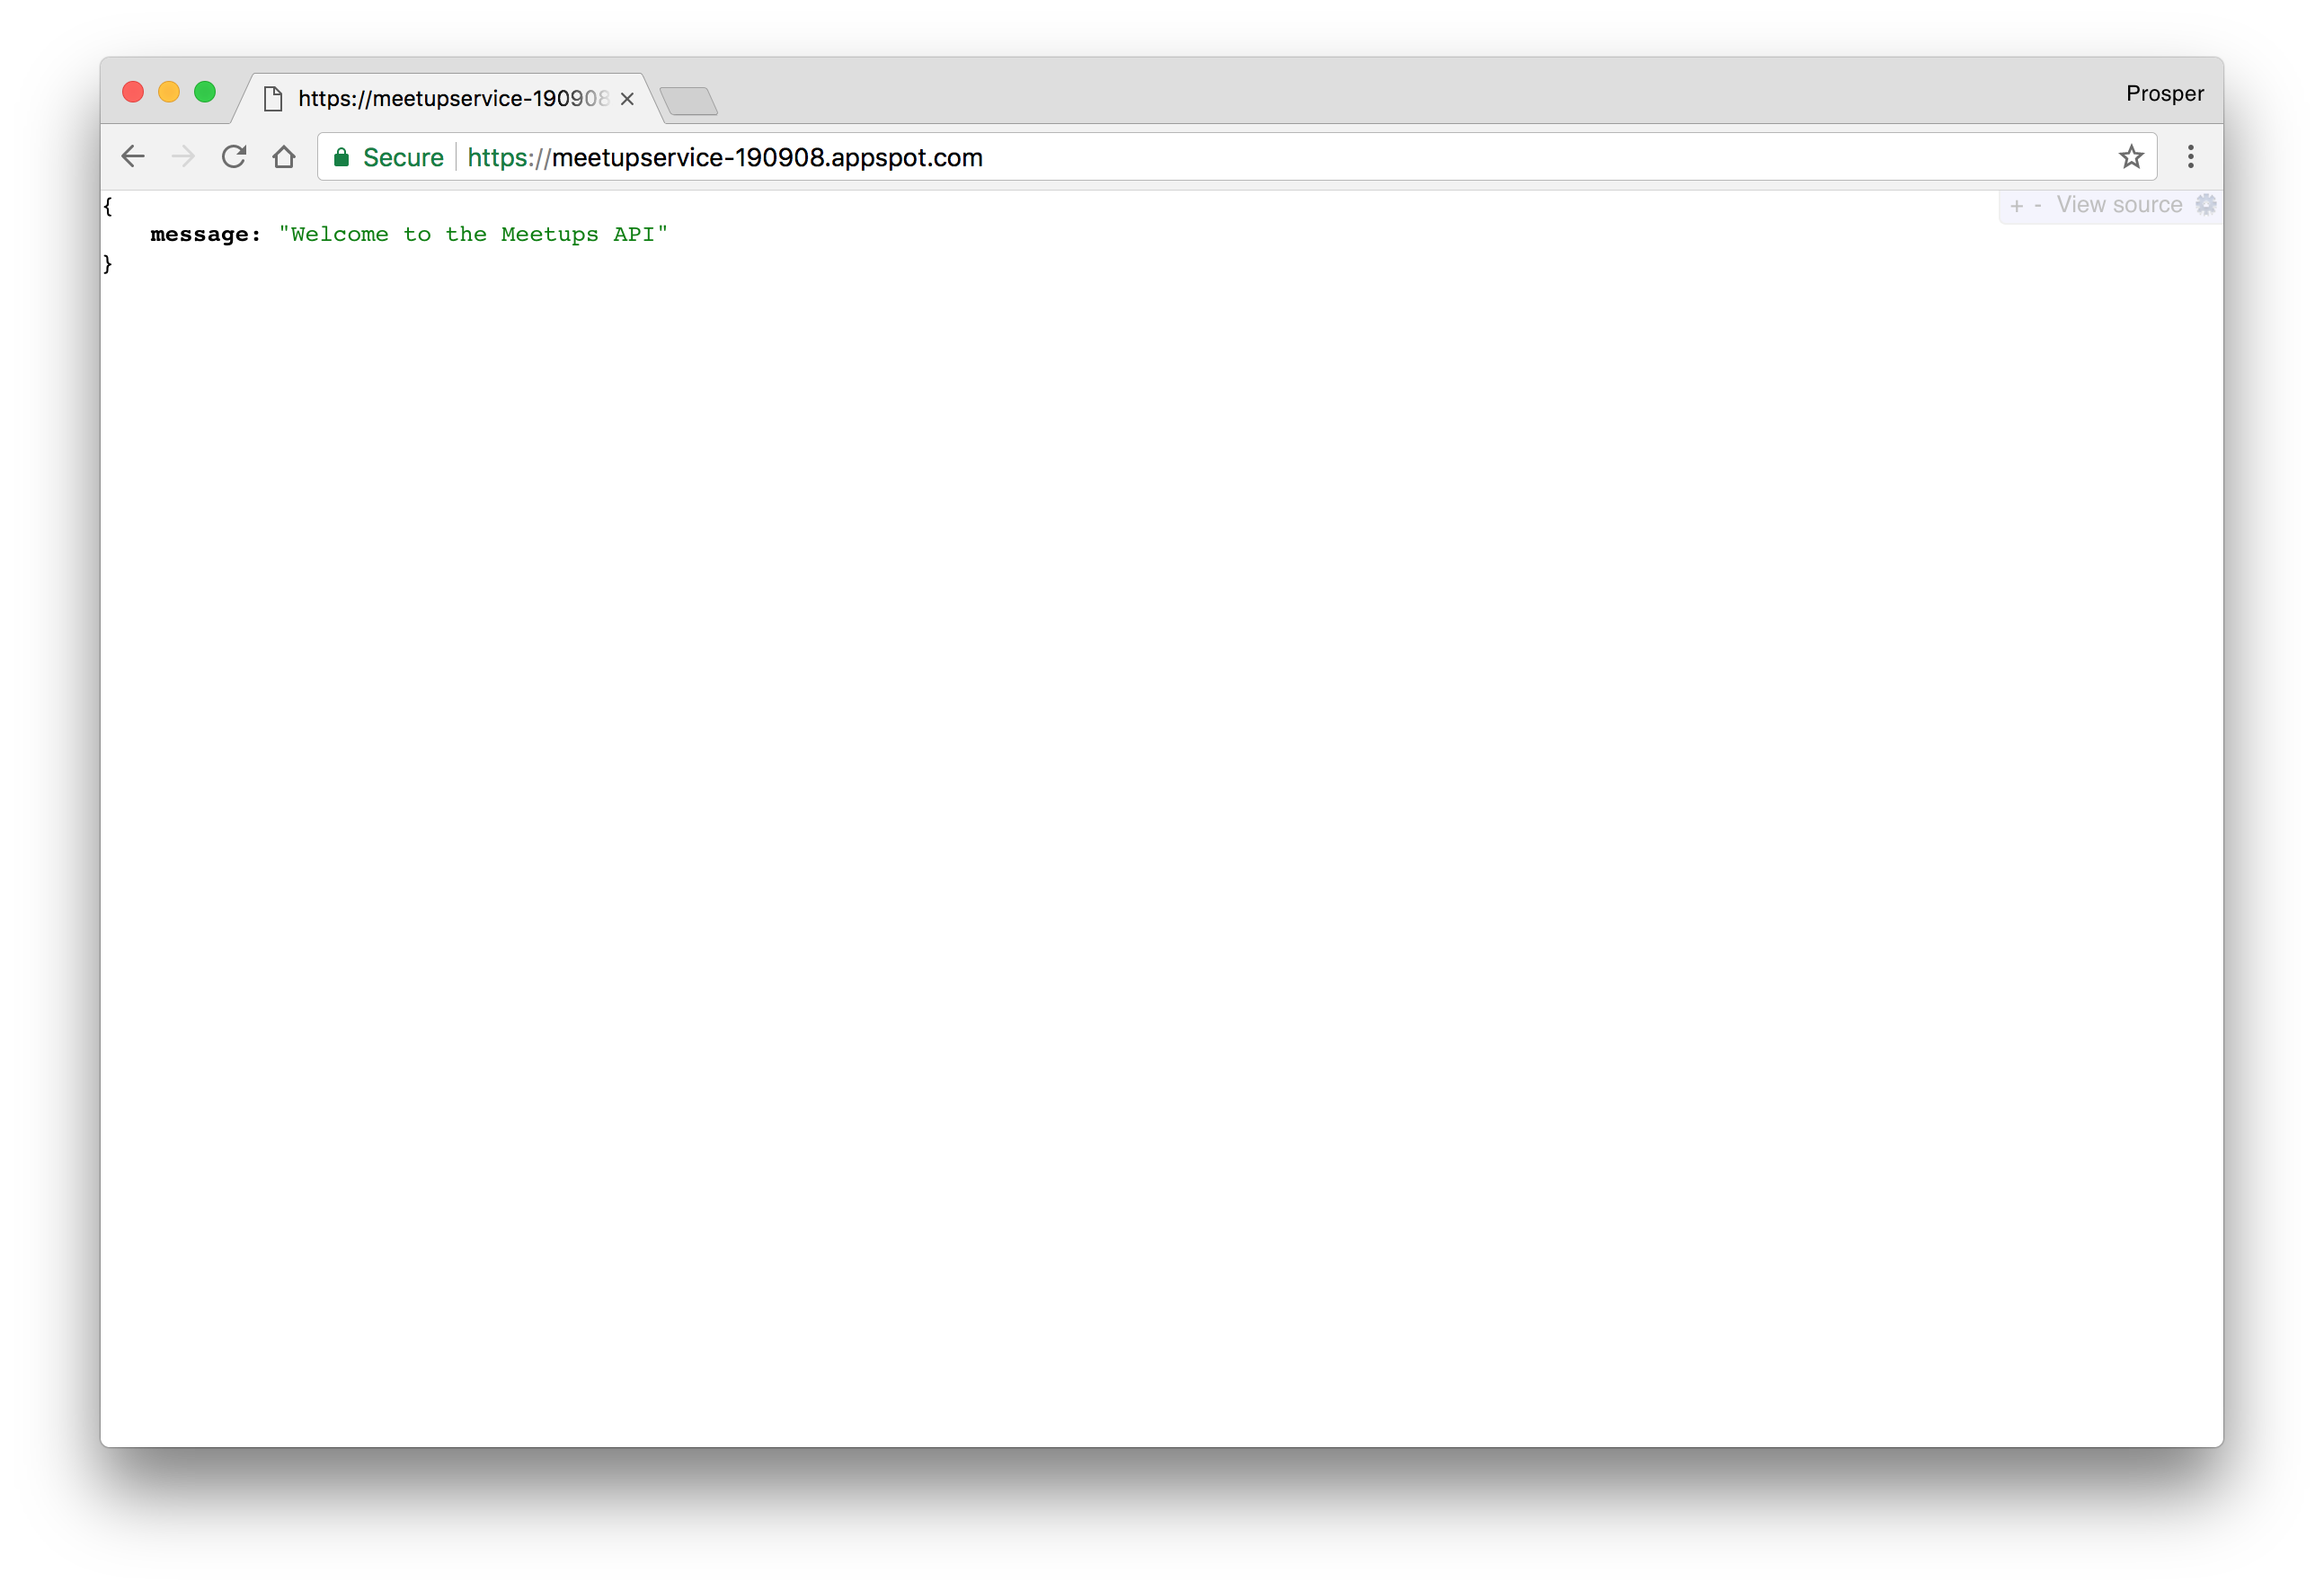 JavaScript Deploy - Live Backend Service